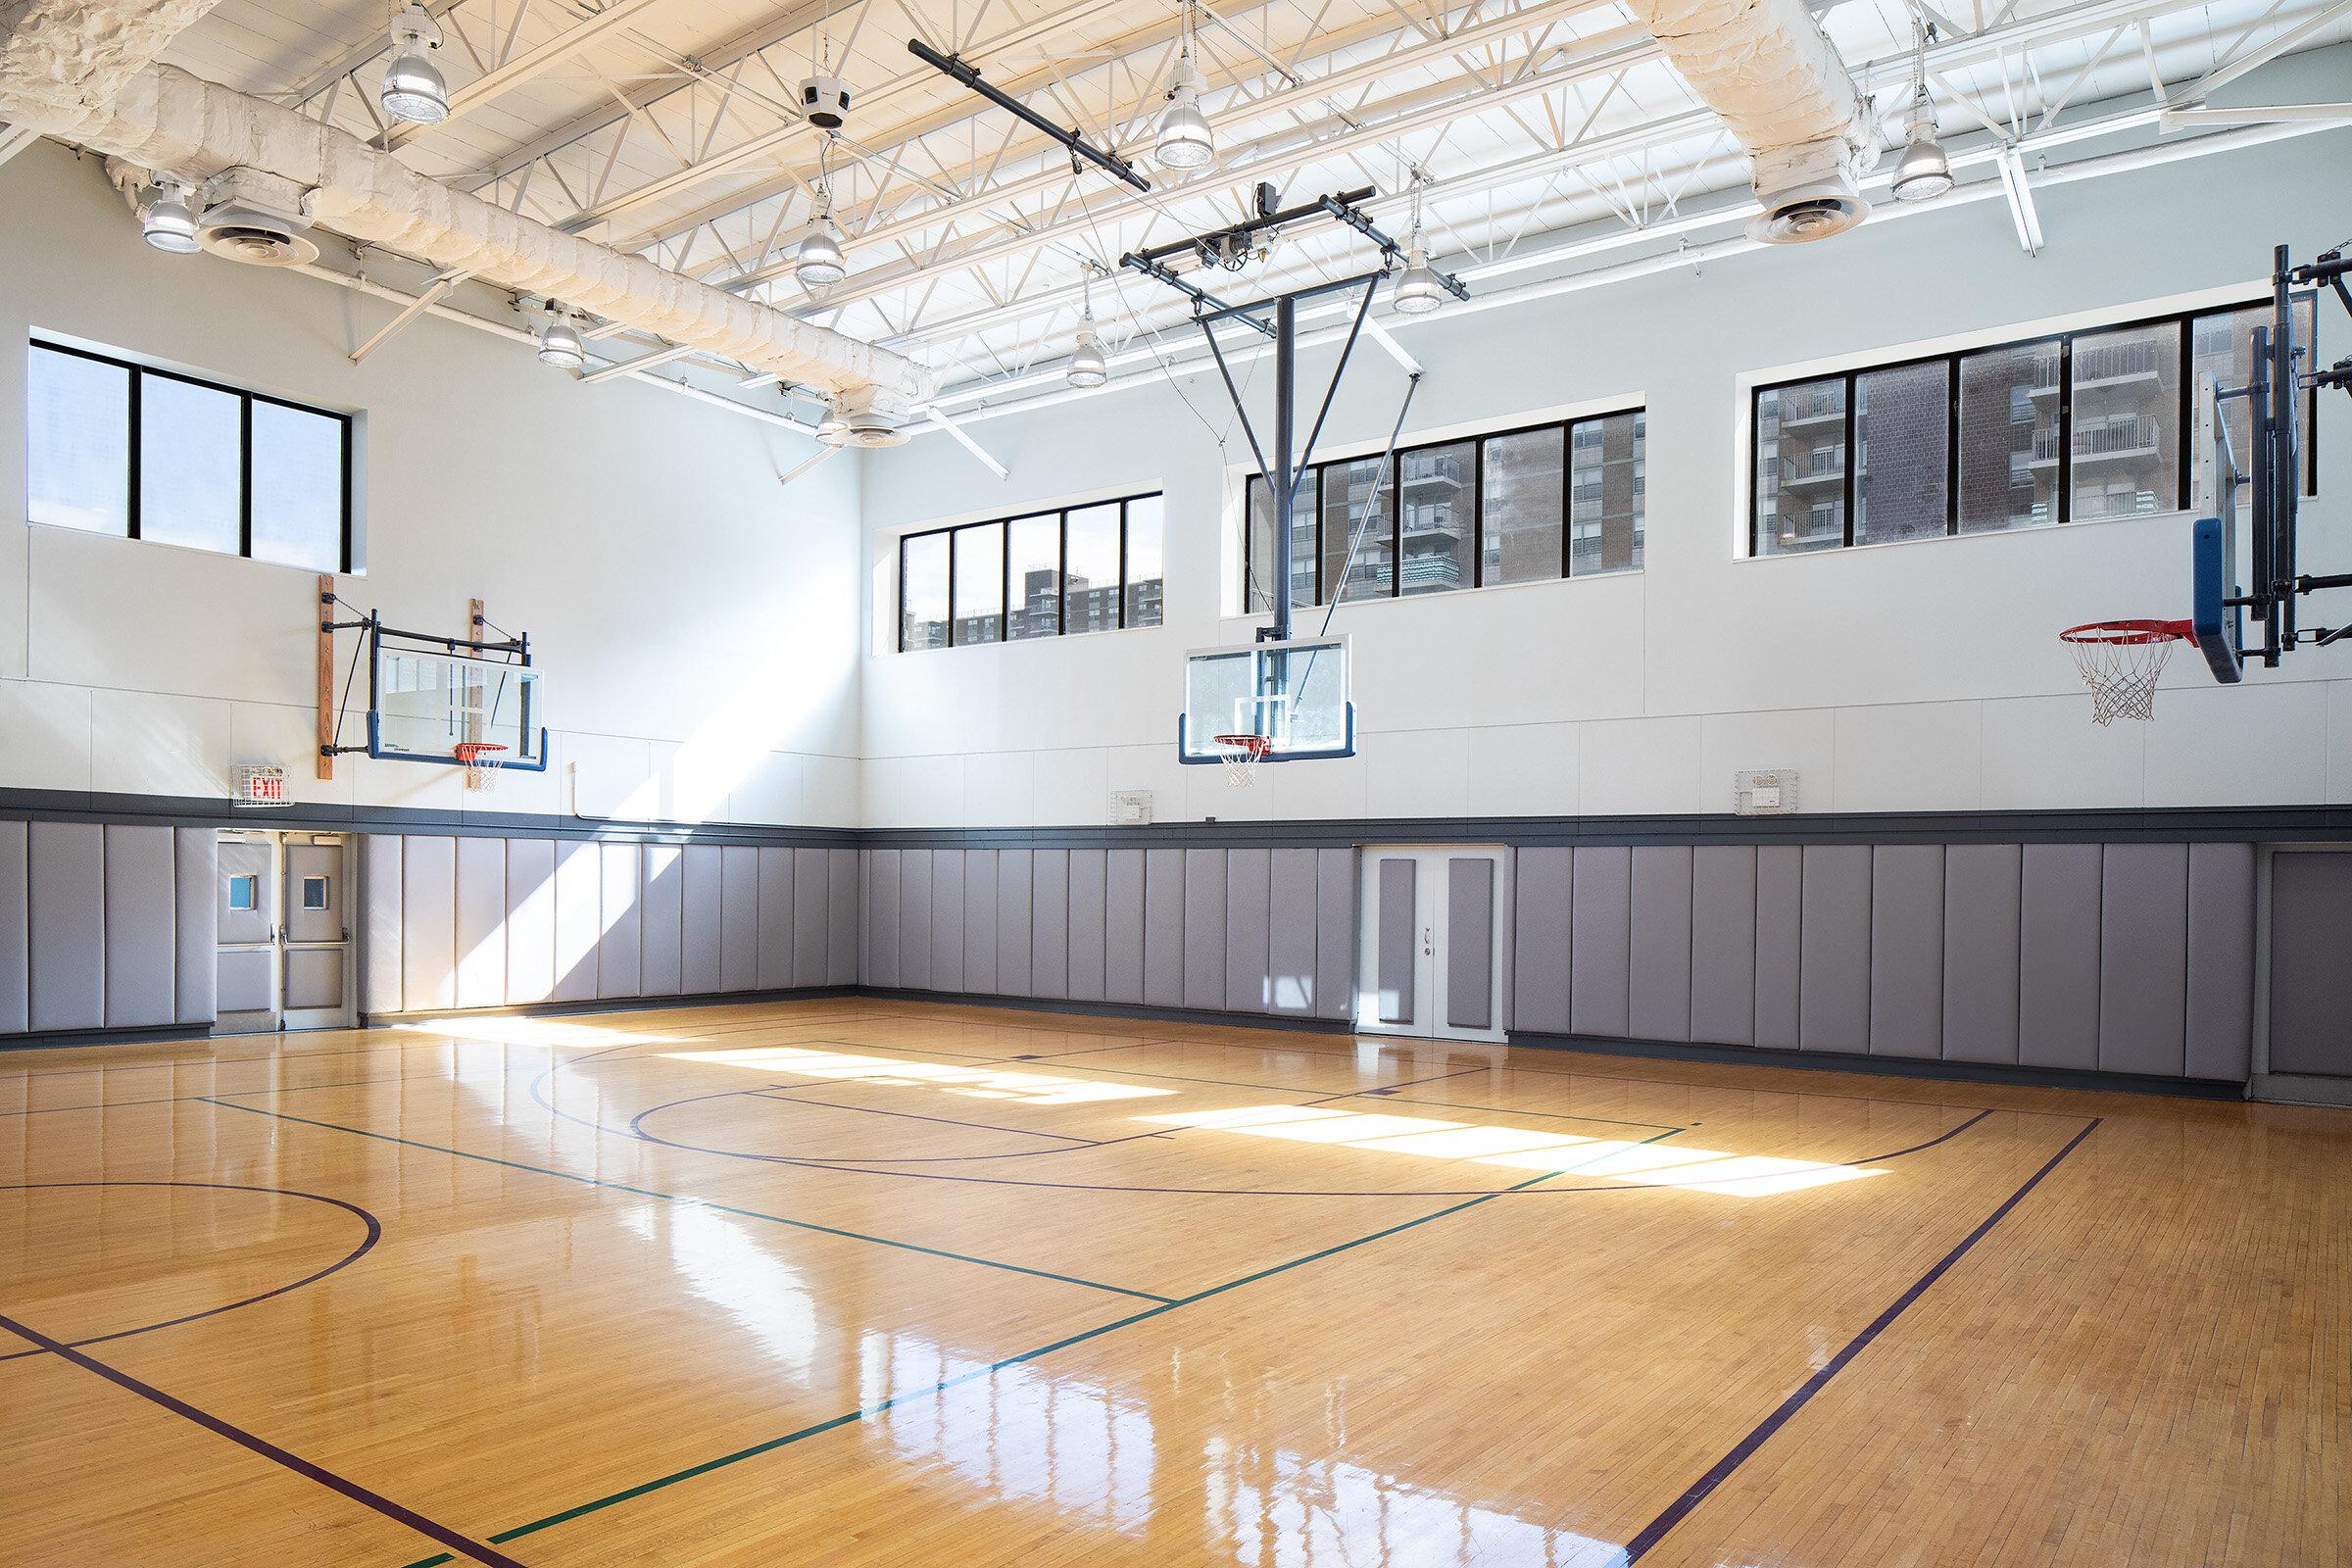 Event Space Brooklyn Sports Club